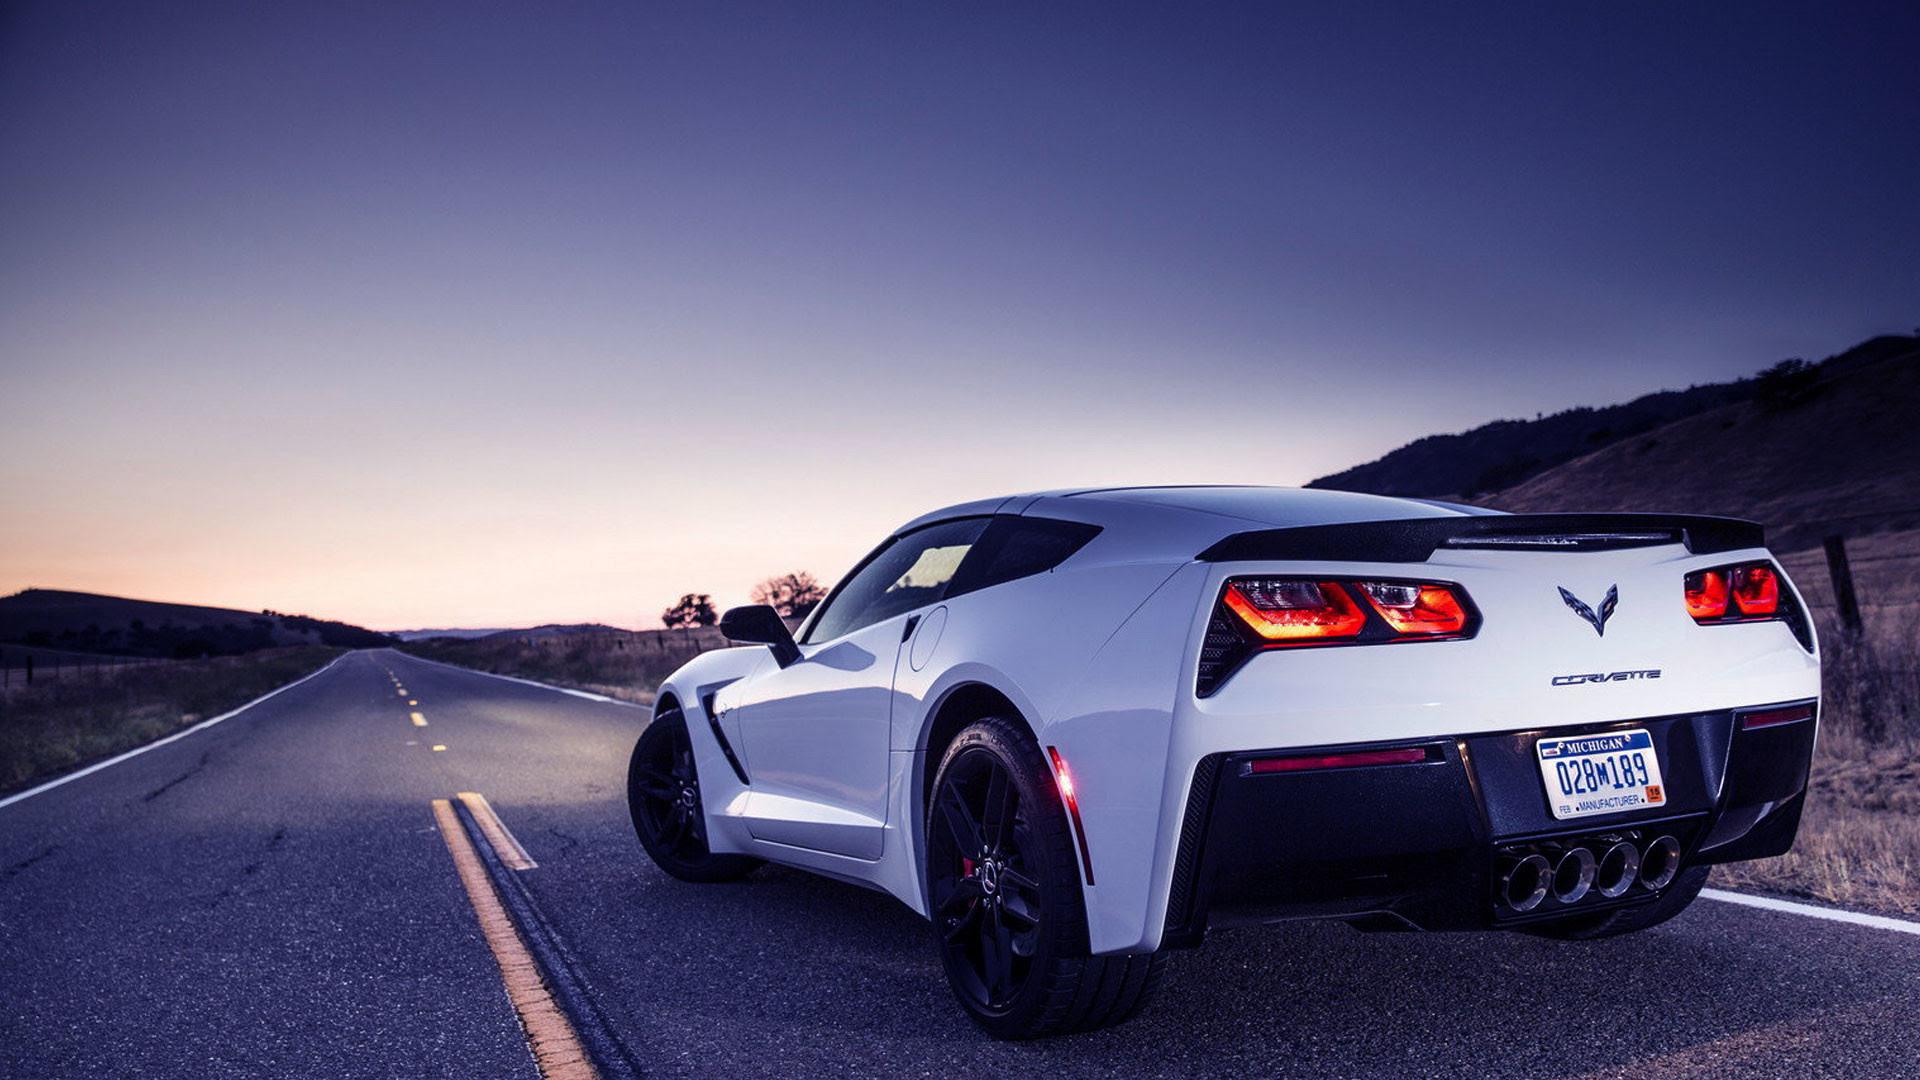 Corvette Stingray 2018 Wallpaper HD 74  images